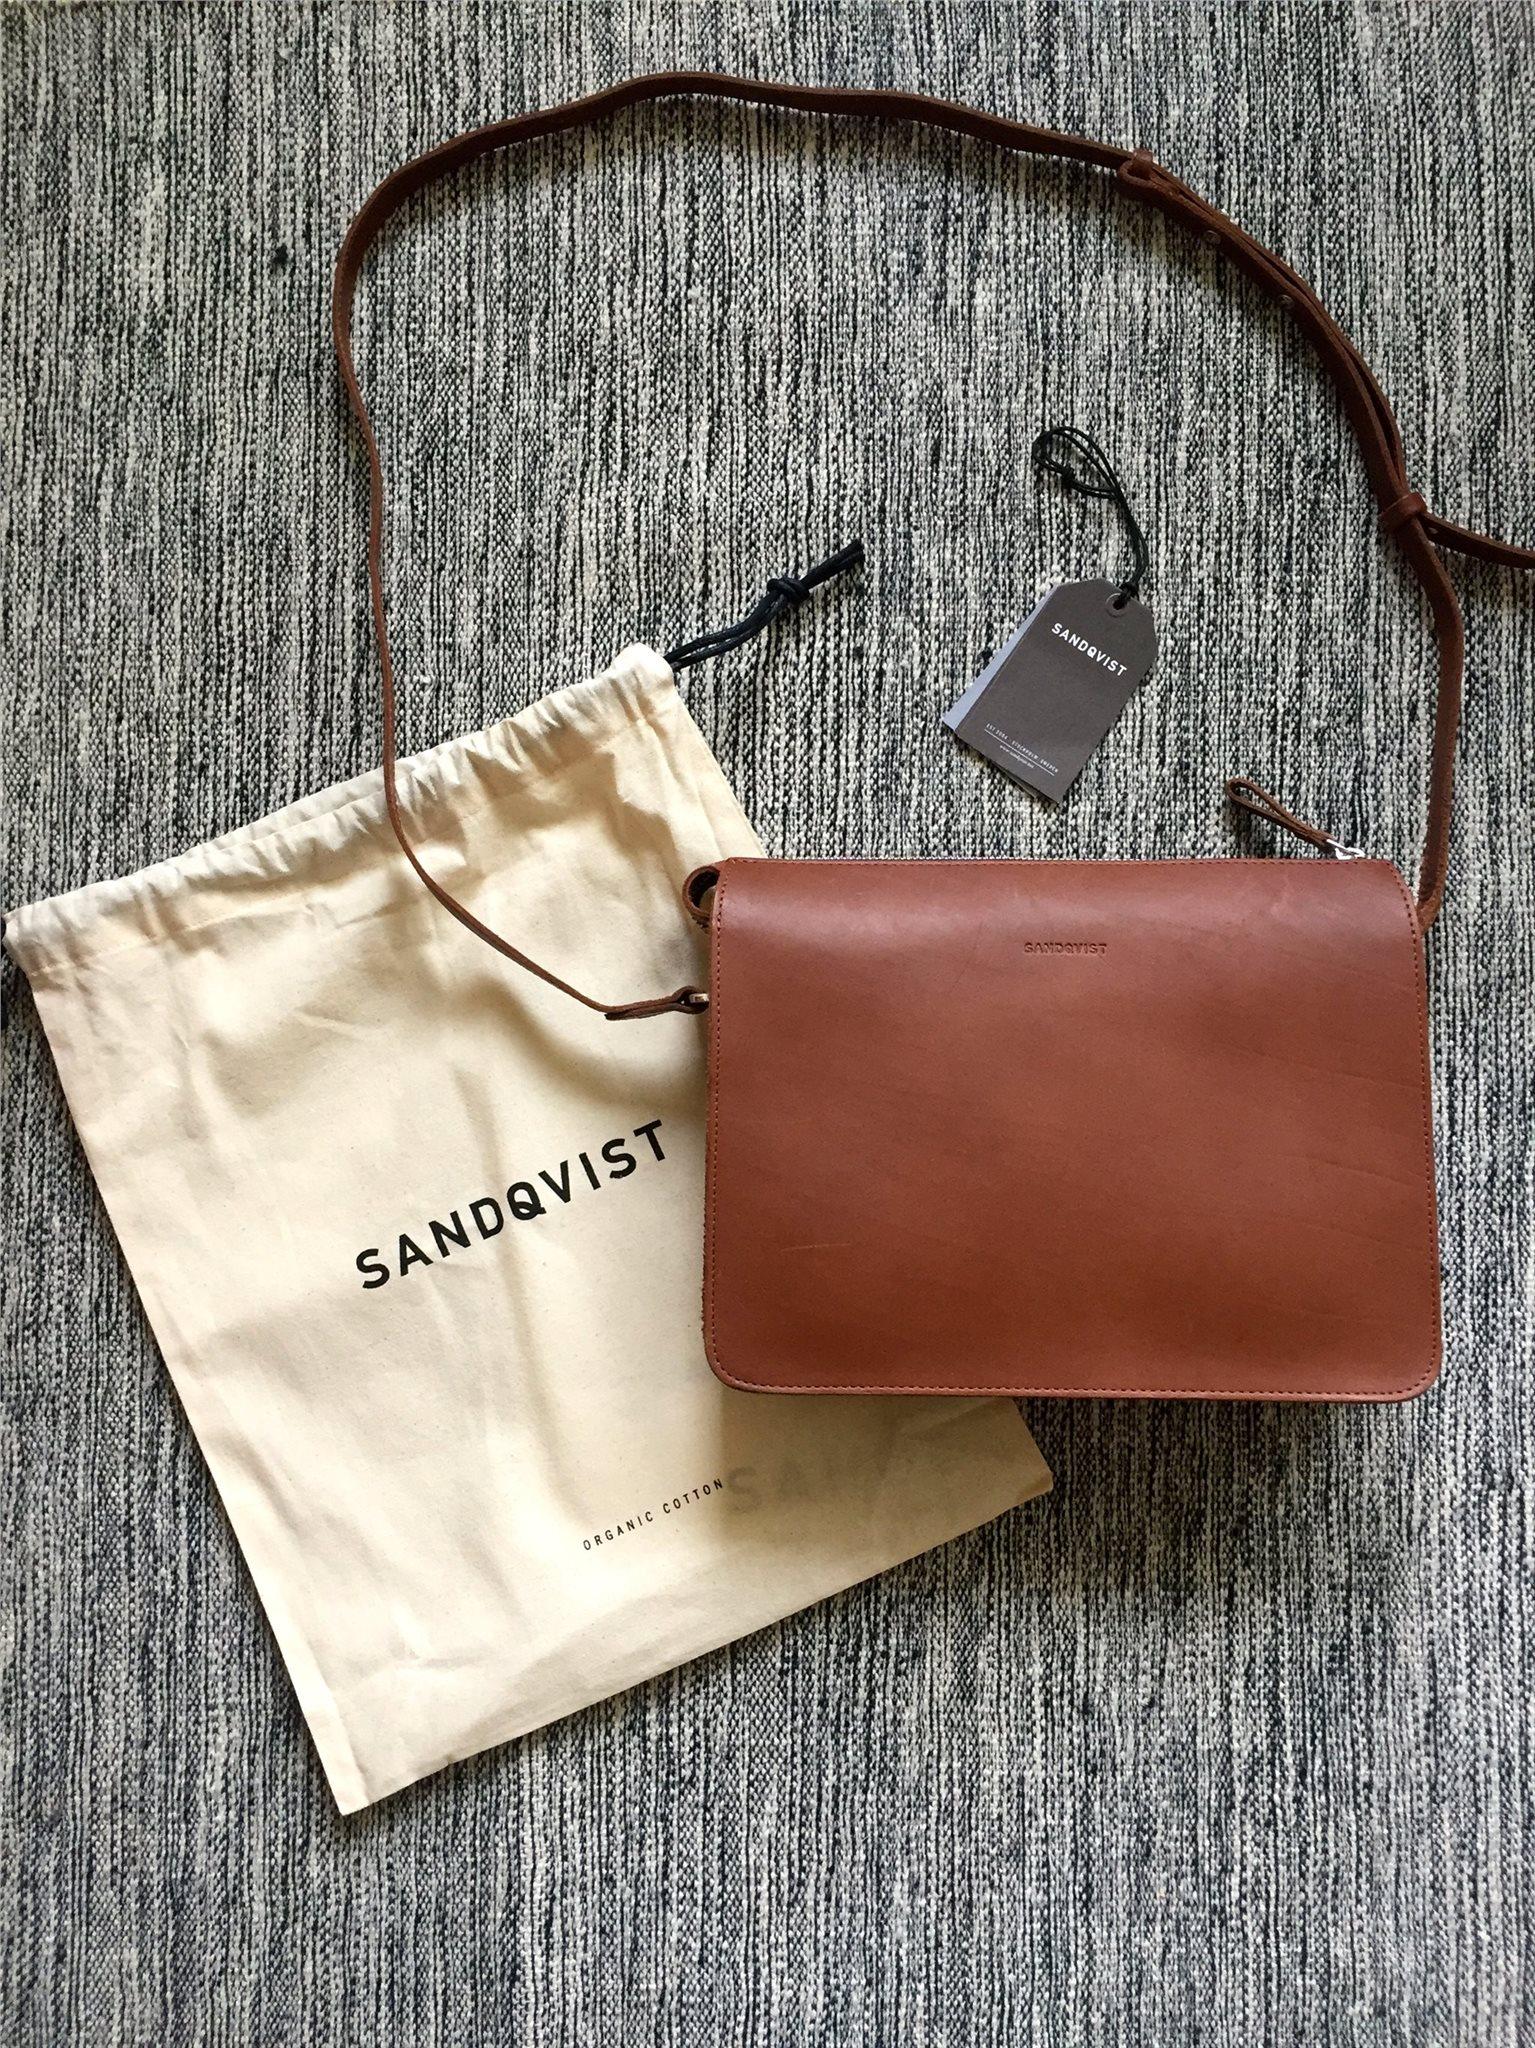 Sandqvist Franka Cognac Brun väska handväska i läder/skinn.